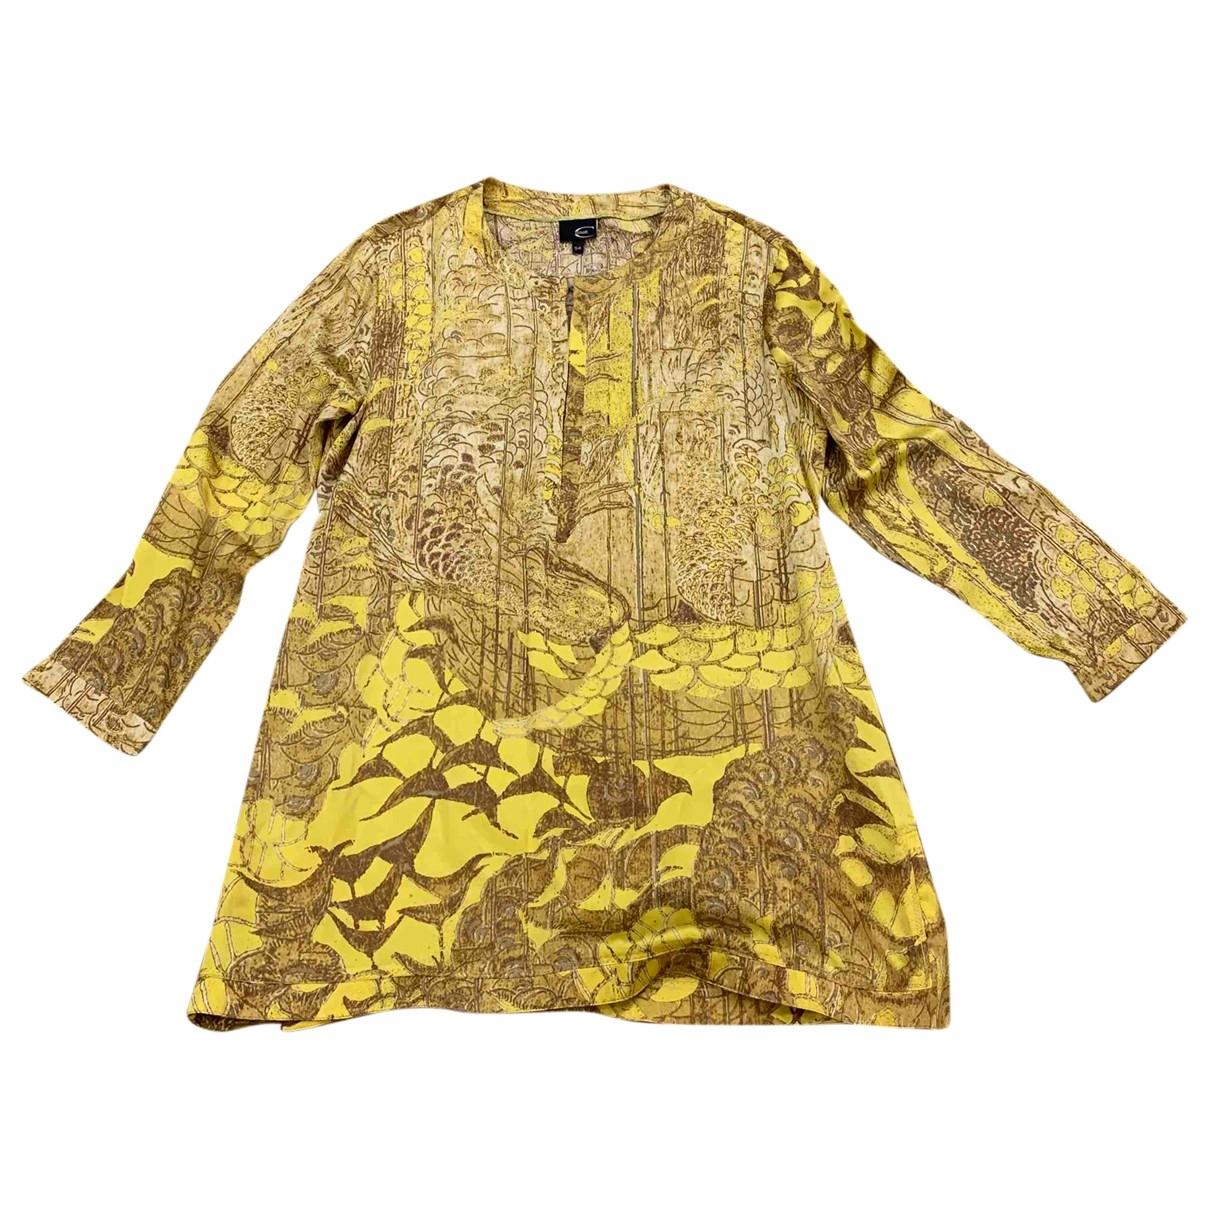 Just Cavalli \N Silk  top for Women 54-56 IT